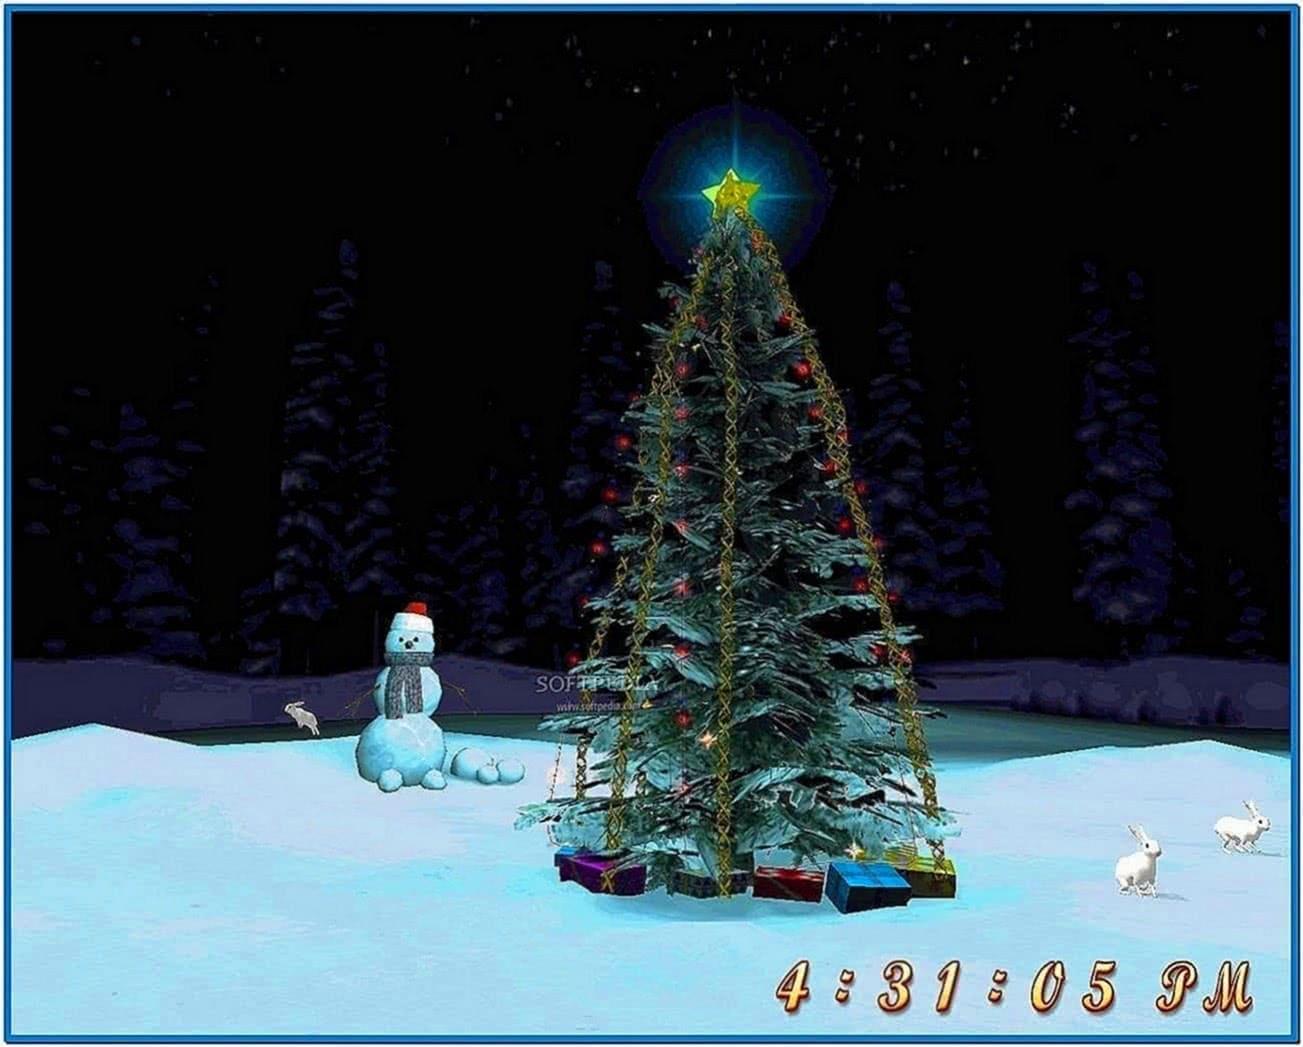 3D Screensaver Christmas Tree